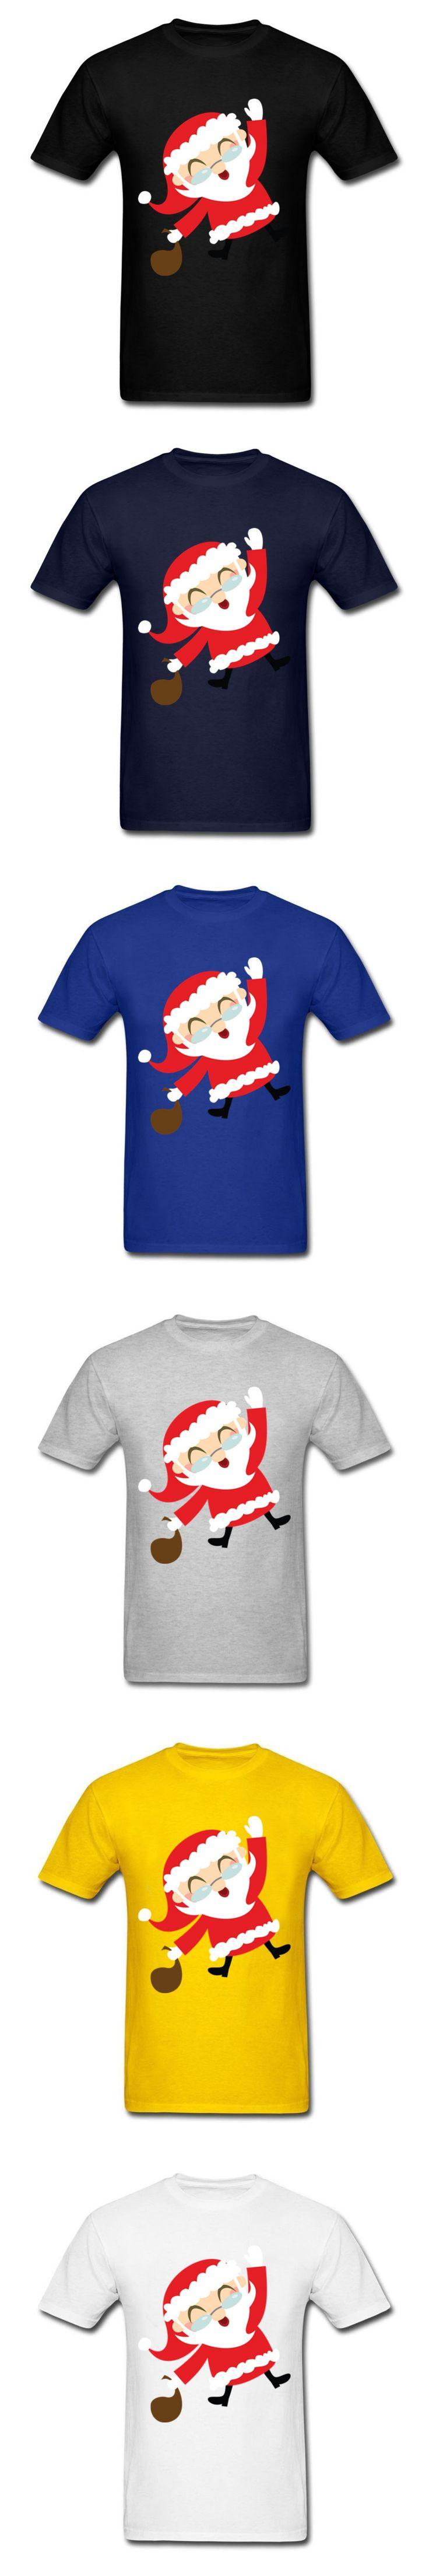 Ugly Christmas Santa Claus Tees Shirt For Men women Brand Clothing Short Sleeve Custom XS-XXXL  T Shirts